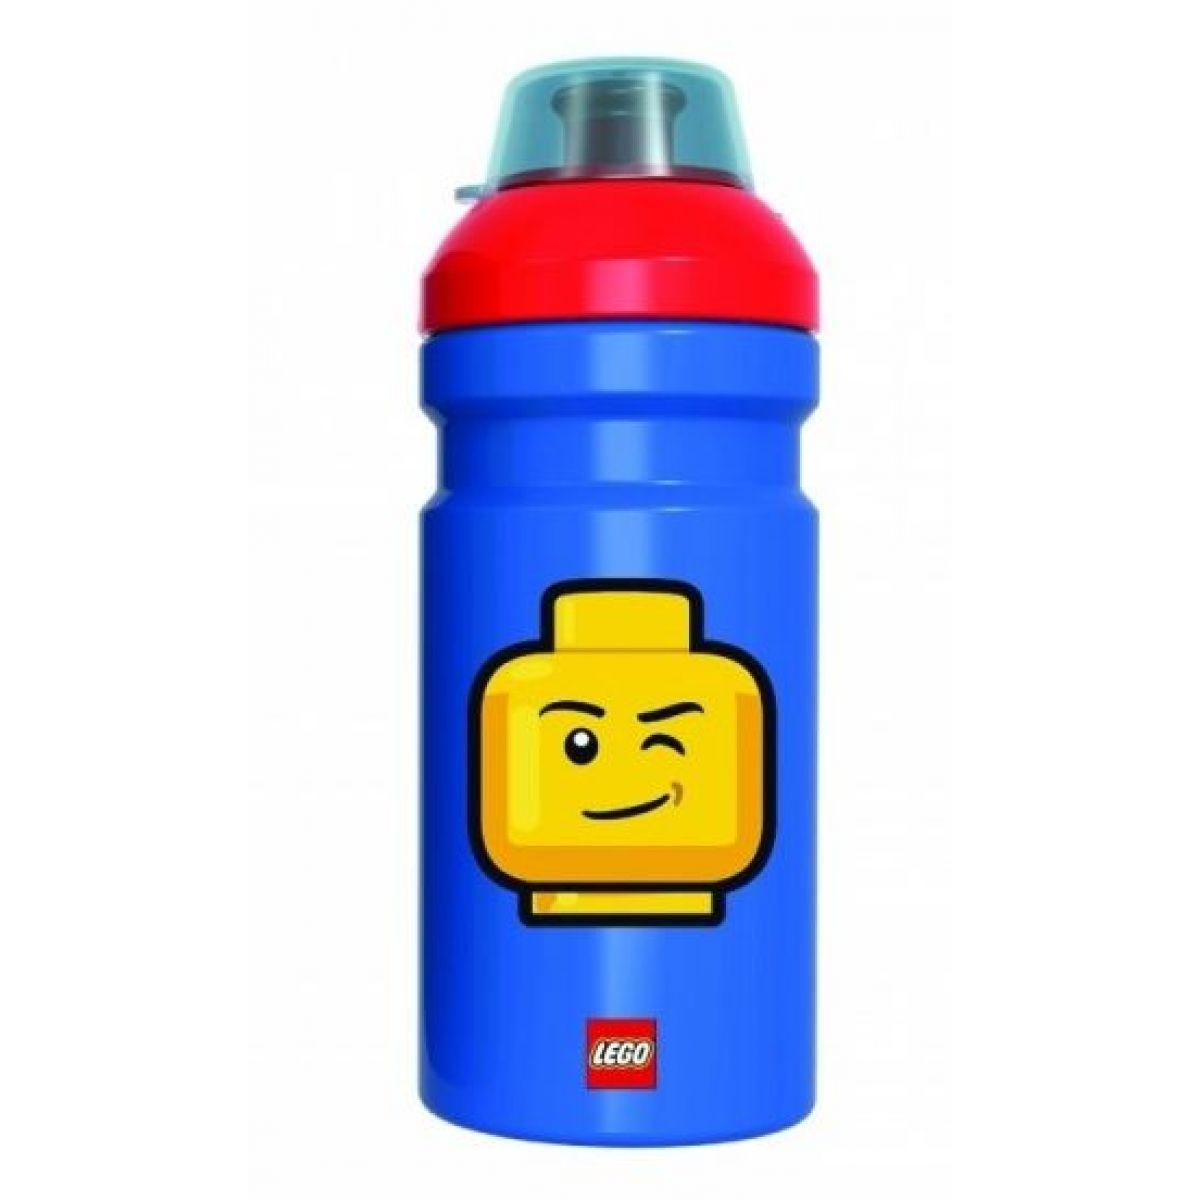 LEGO Iconic Classic fľaša na pitie červená a modrá